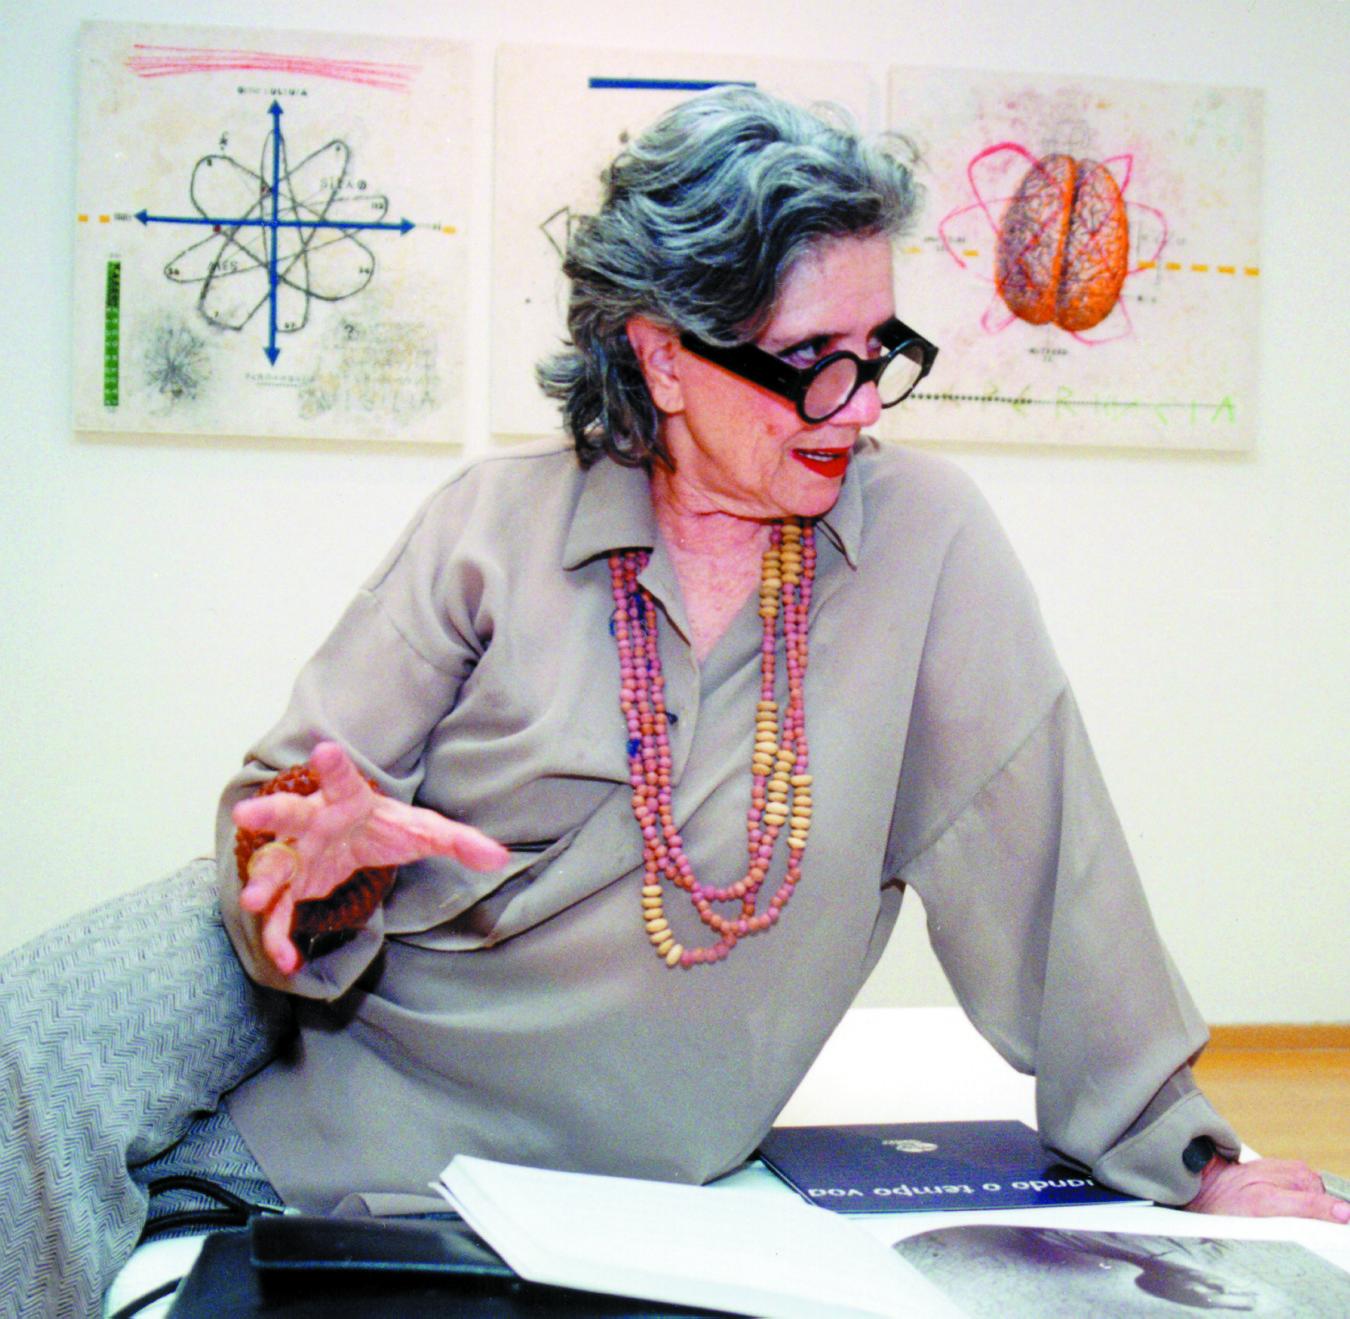 Janete Costa arquitetura arte popular artesanato - #SIM12 - Janete Costa: Se Midas fosse mulher...